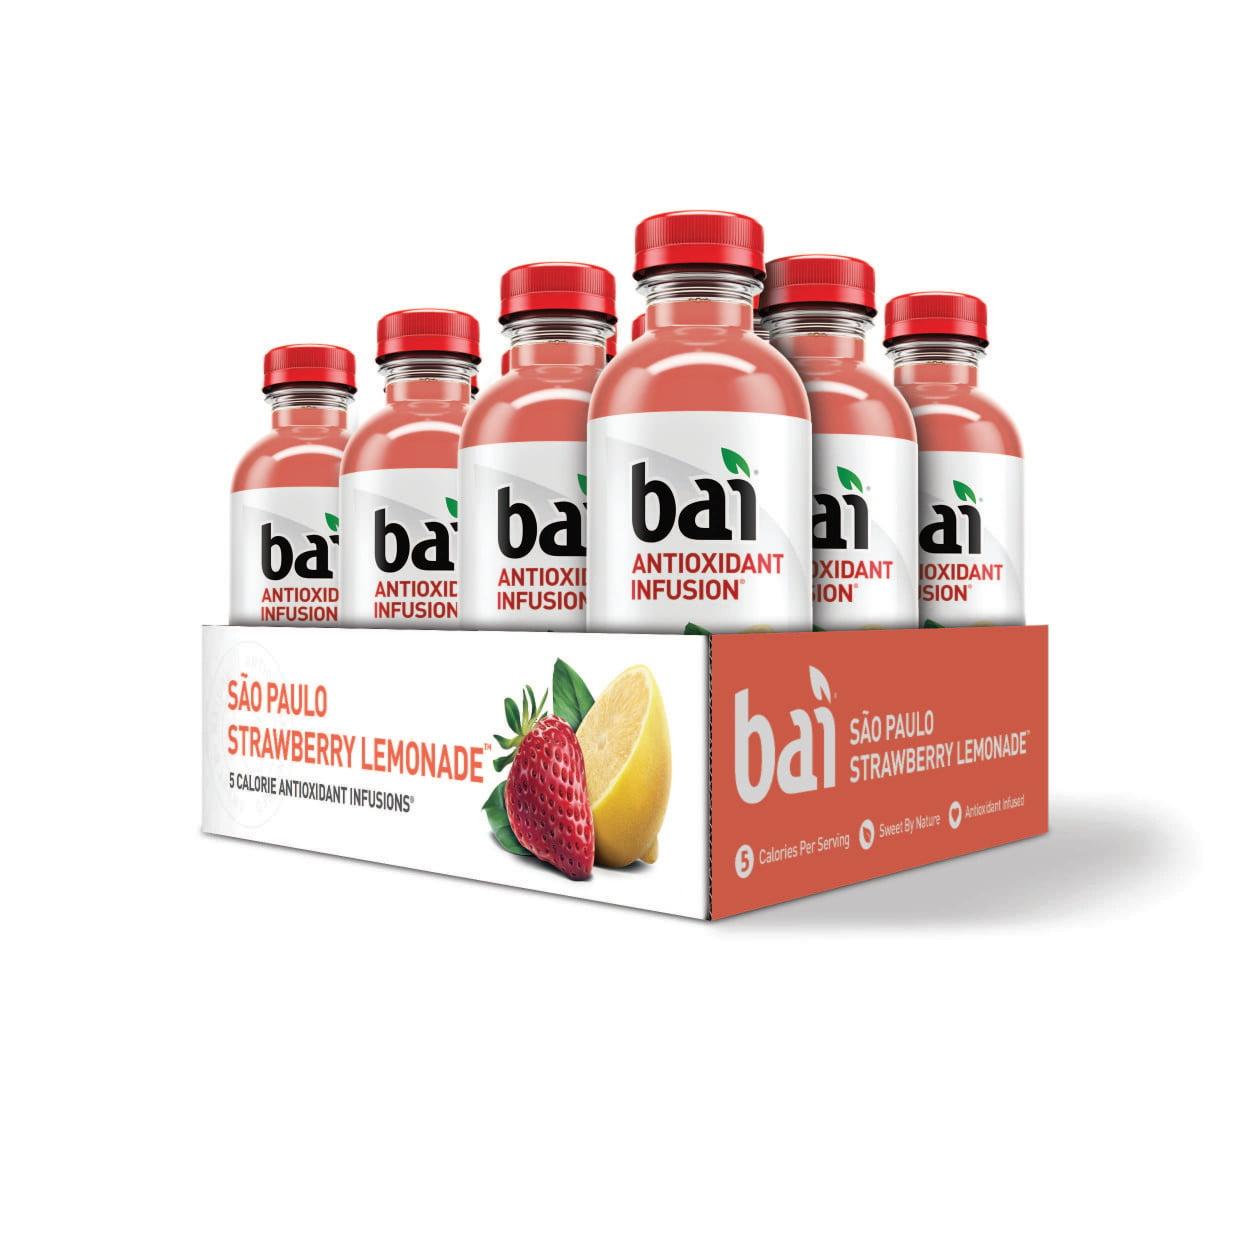 Bai Antioxidant Infused Beverage, Sao Paulo Strawberry Lemon, 18 Fl Oz, 12 Count